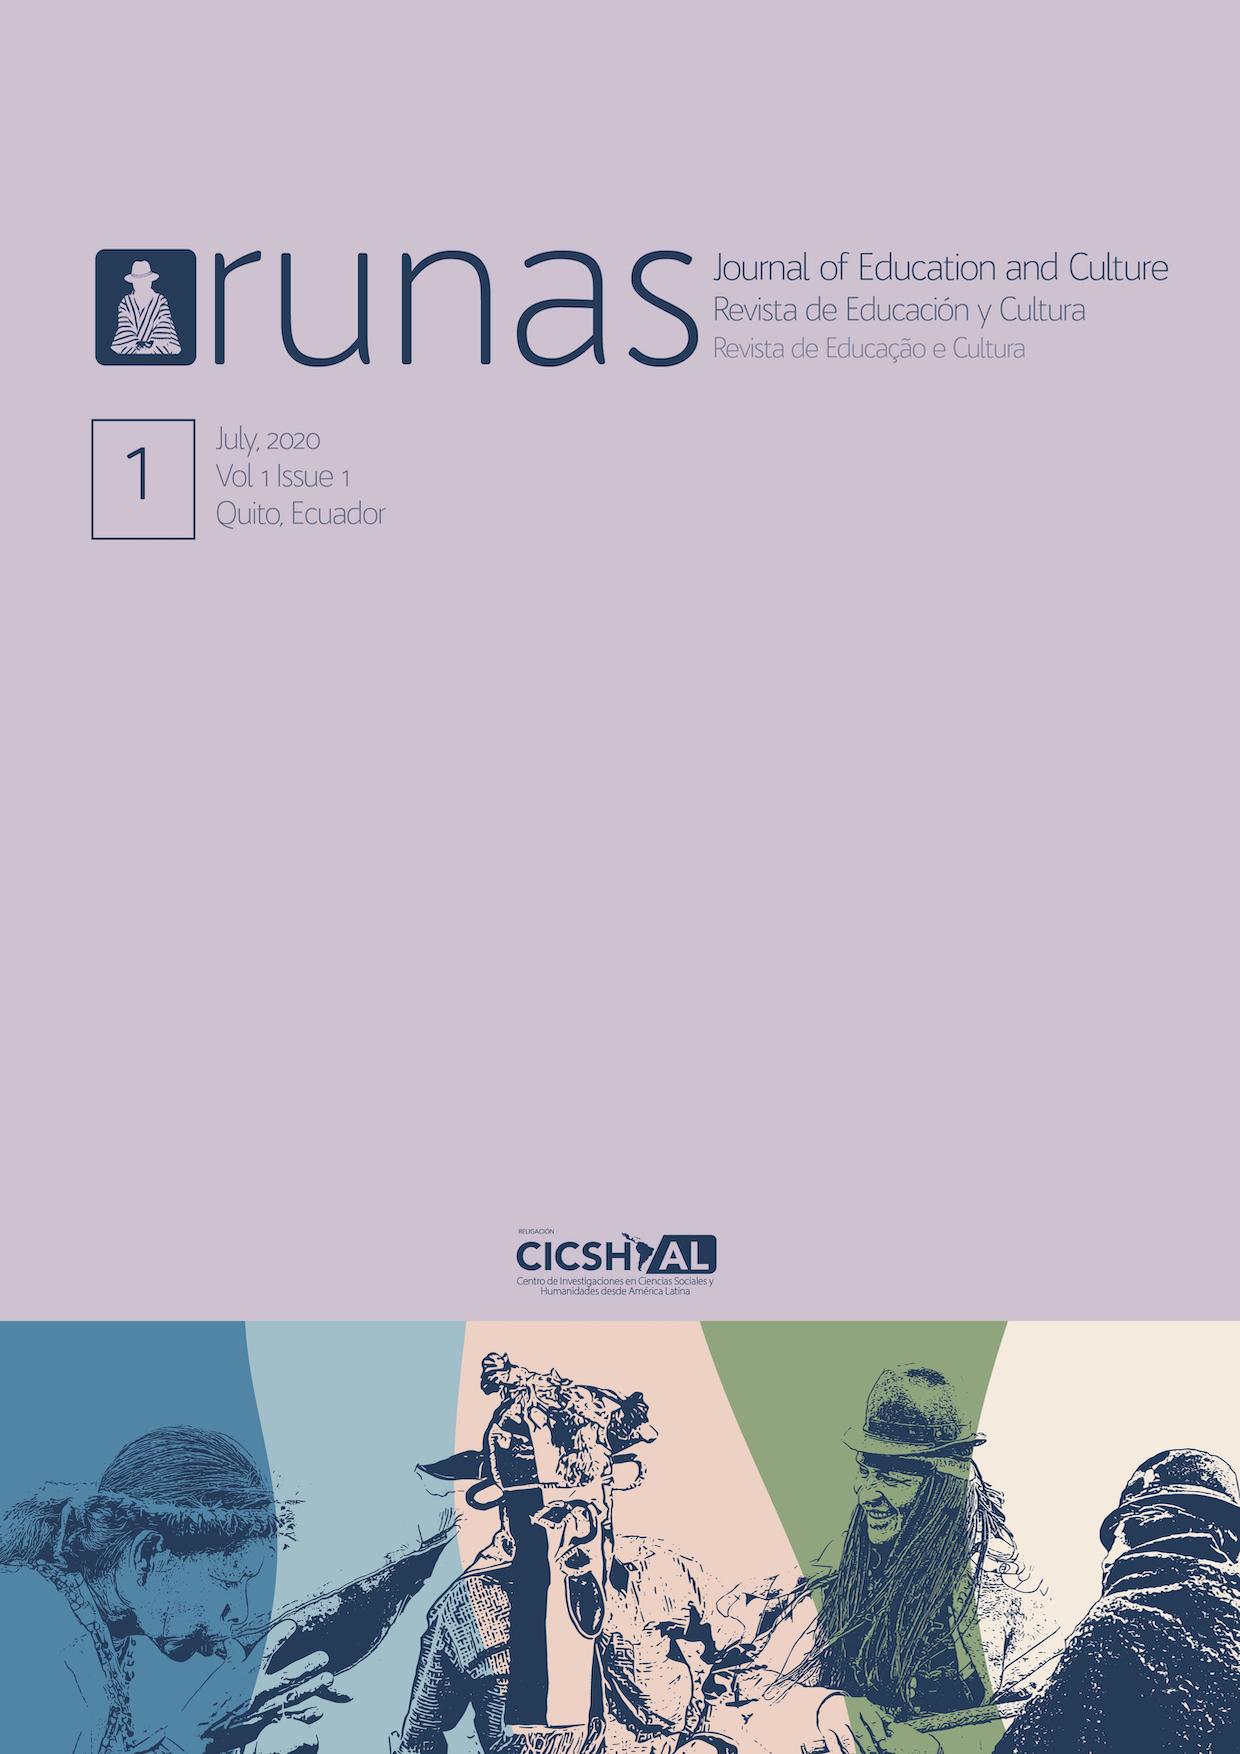 runas journal